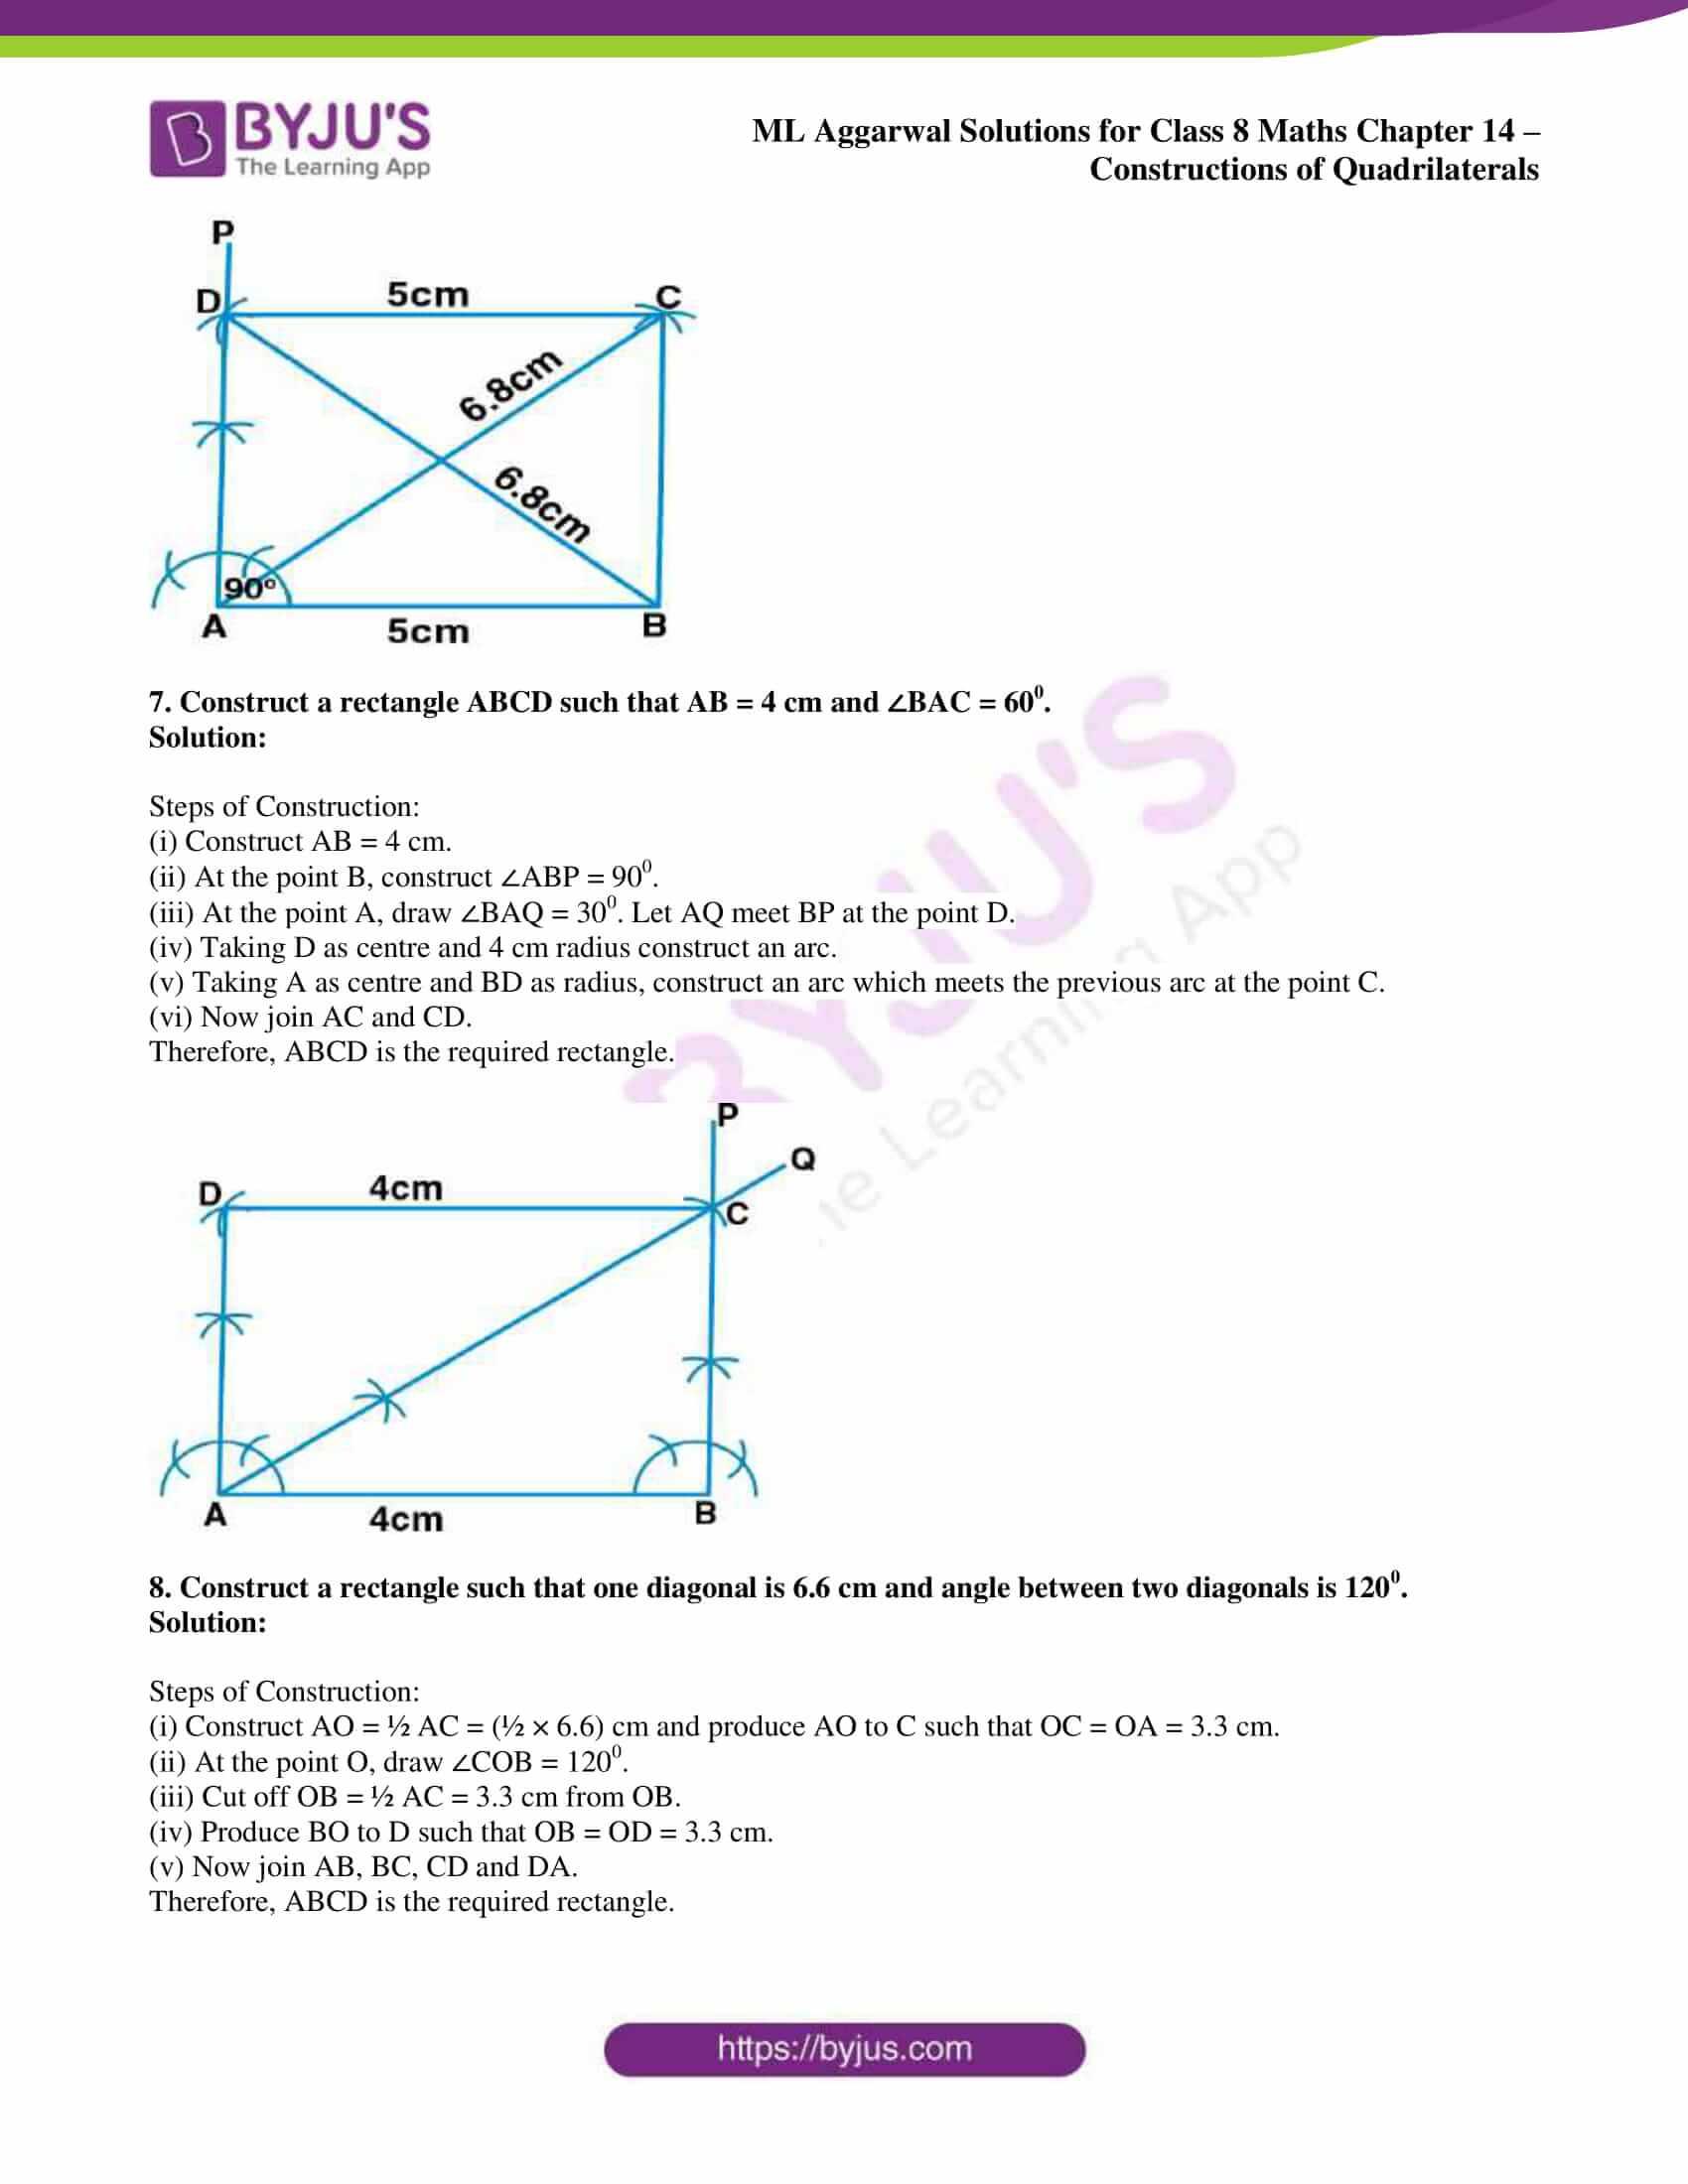 ml aggarwal sol class 7 maths chapter 14 10